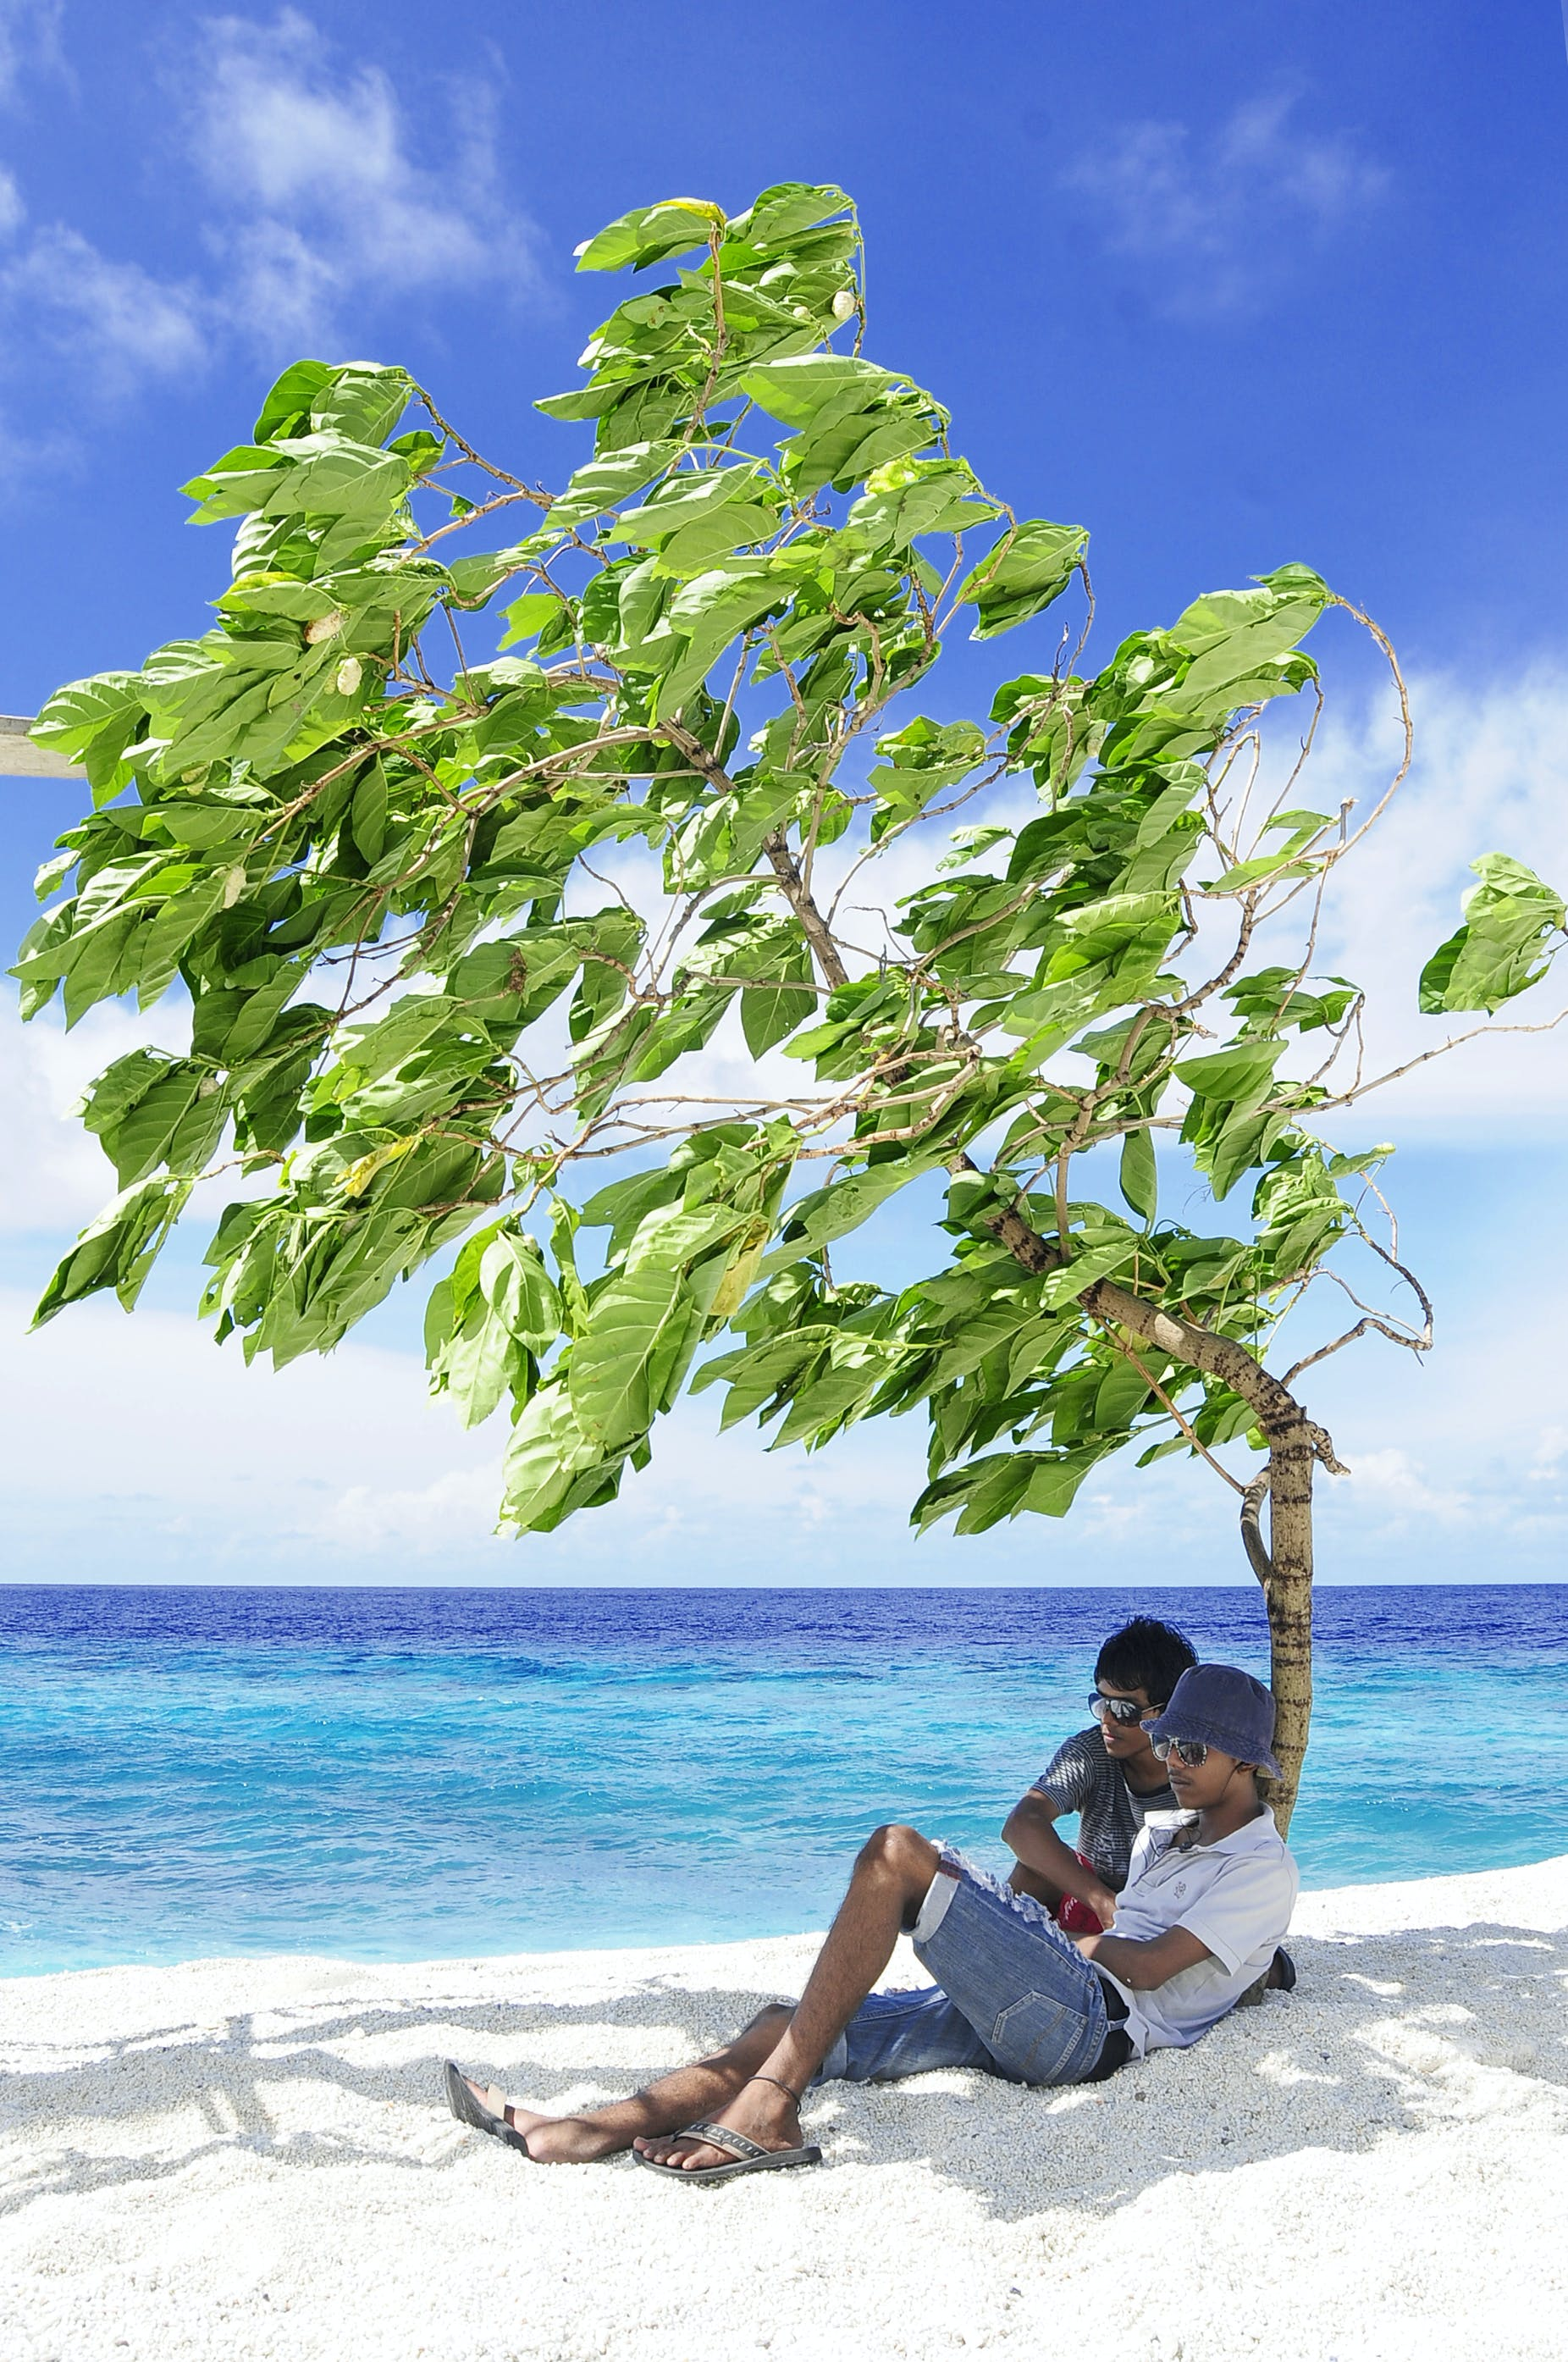 Free stock photo of sea, nature, sky, sunny